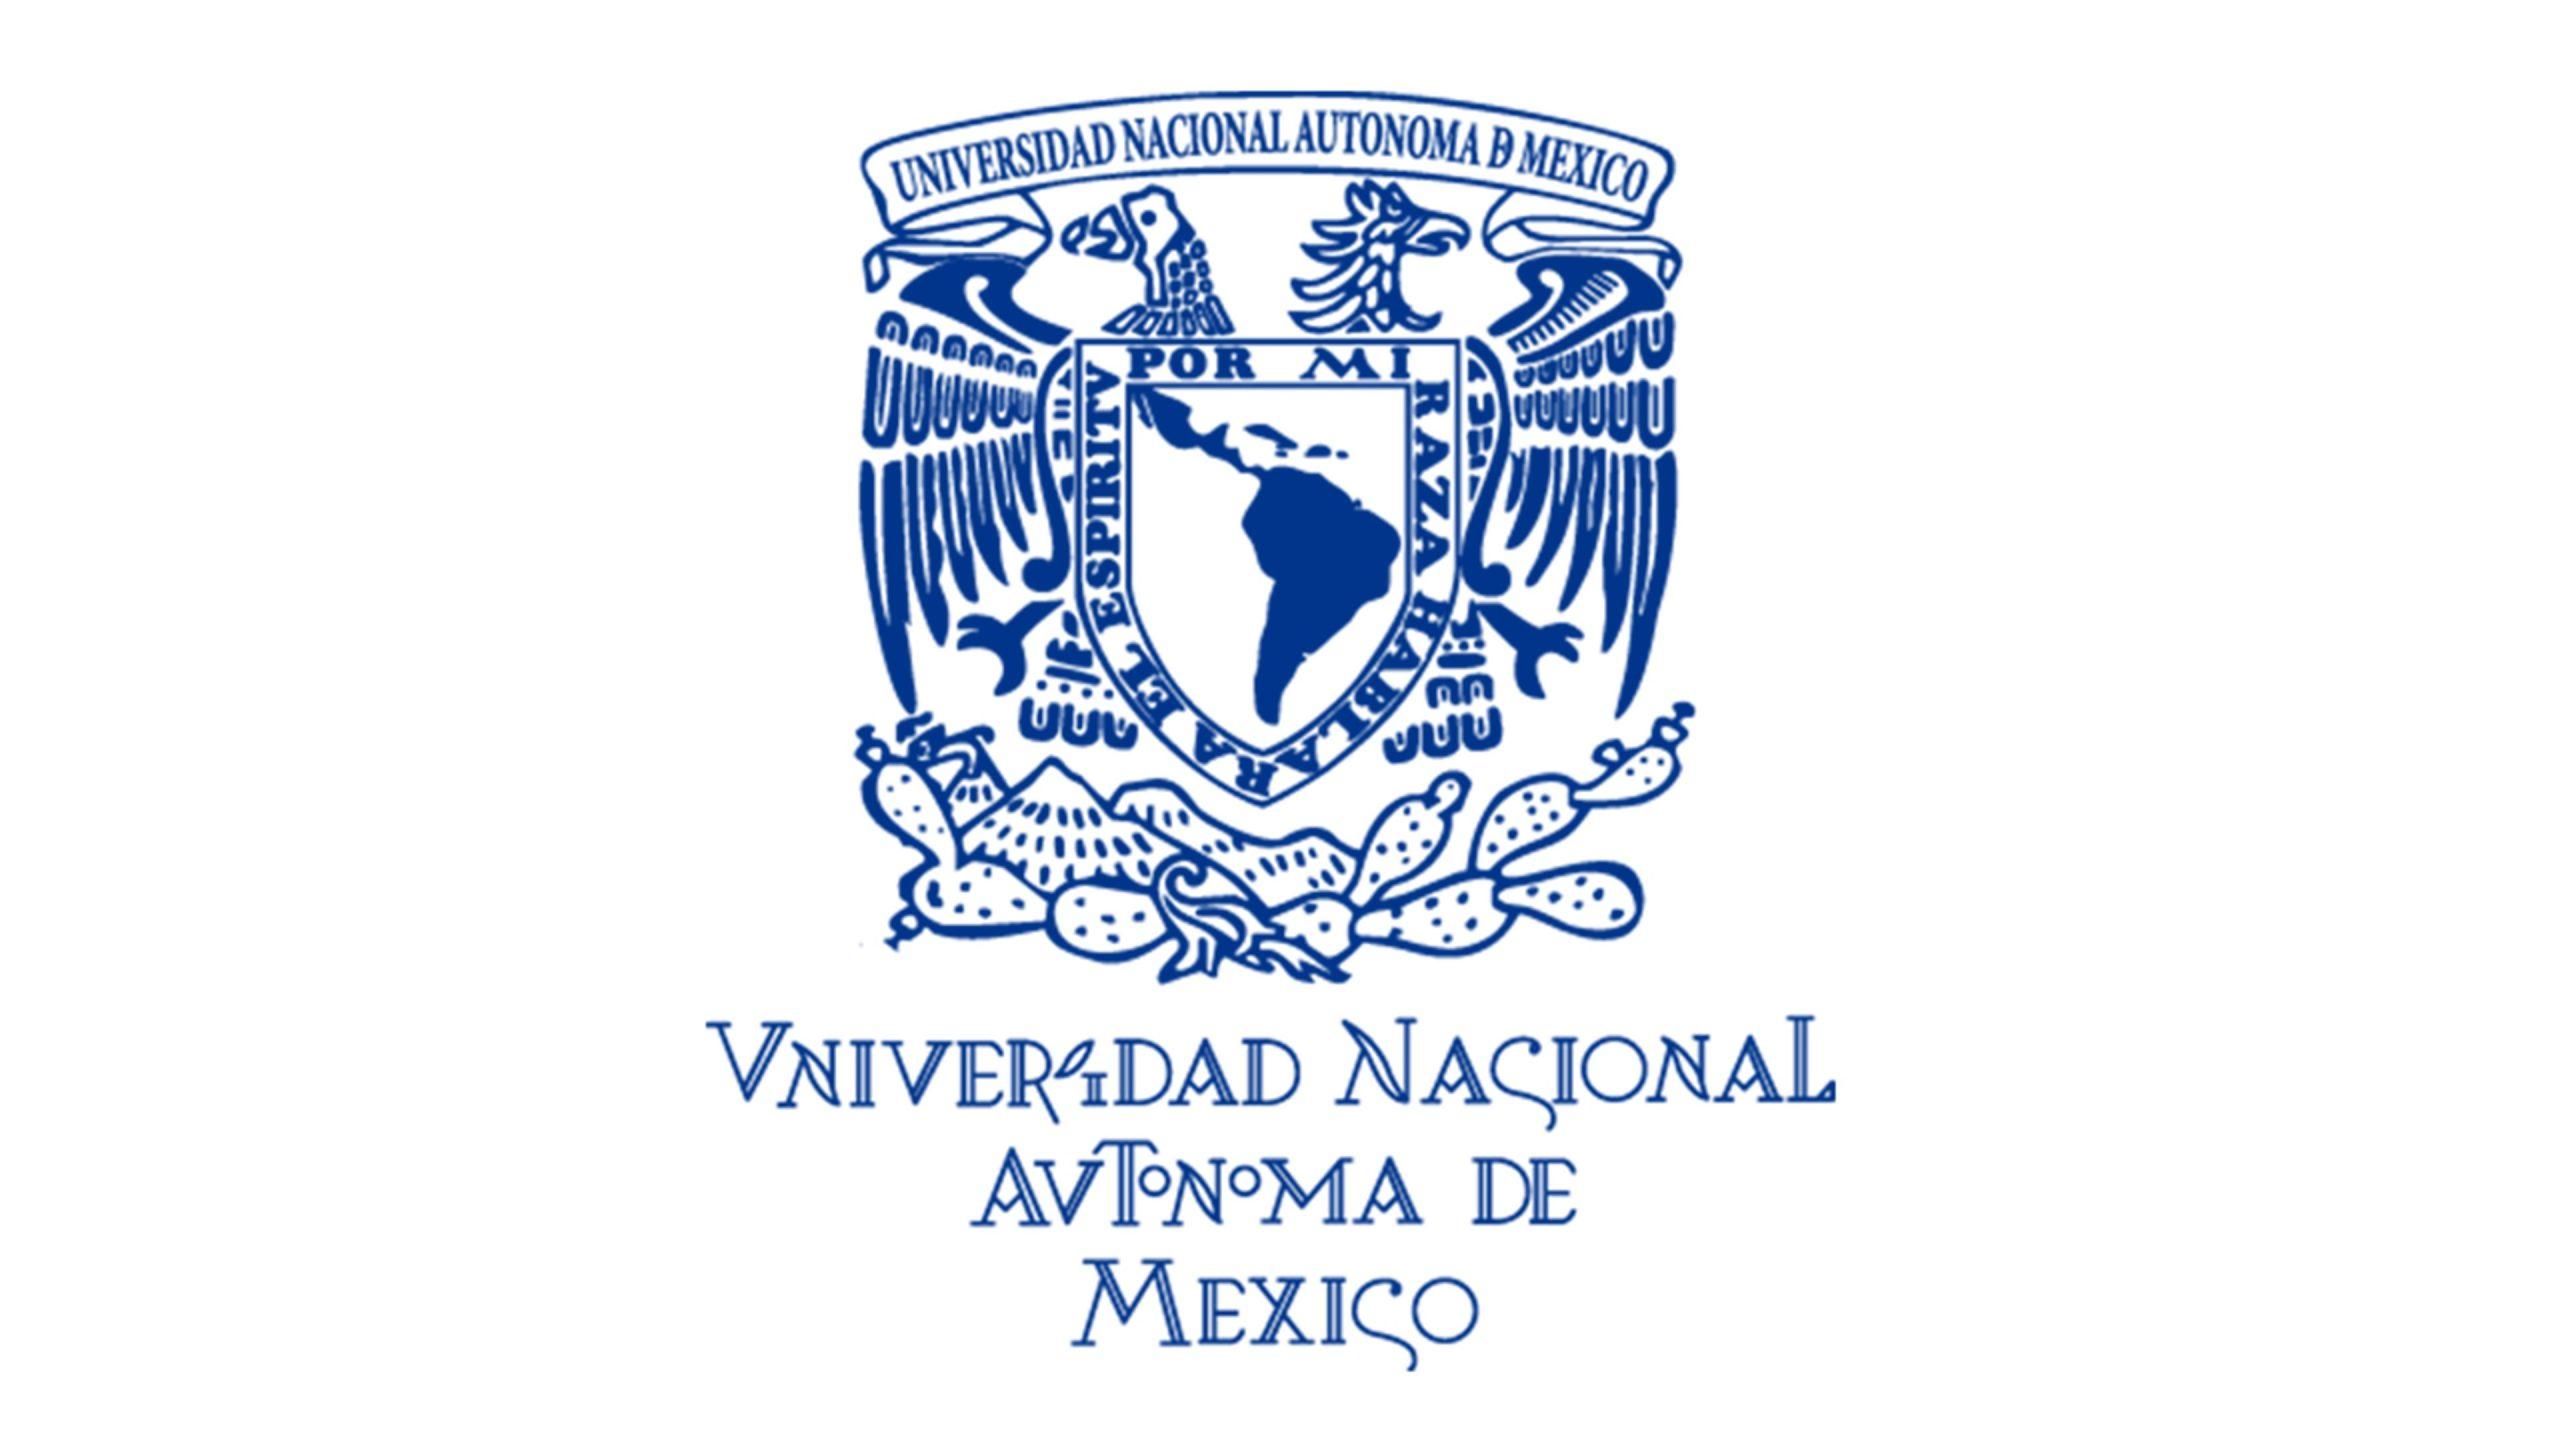 University of Mexico City